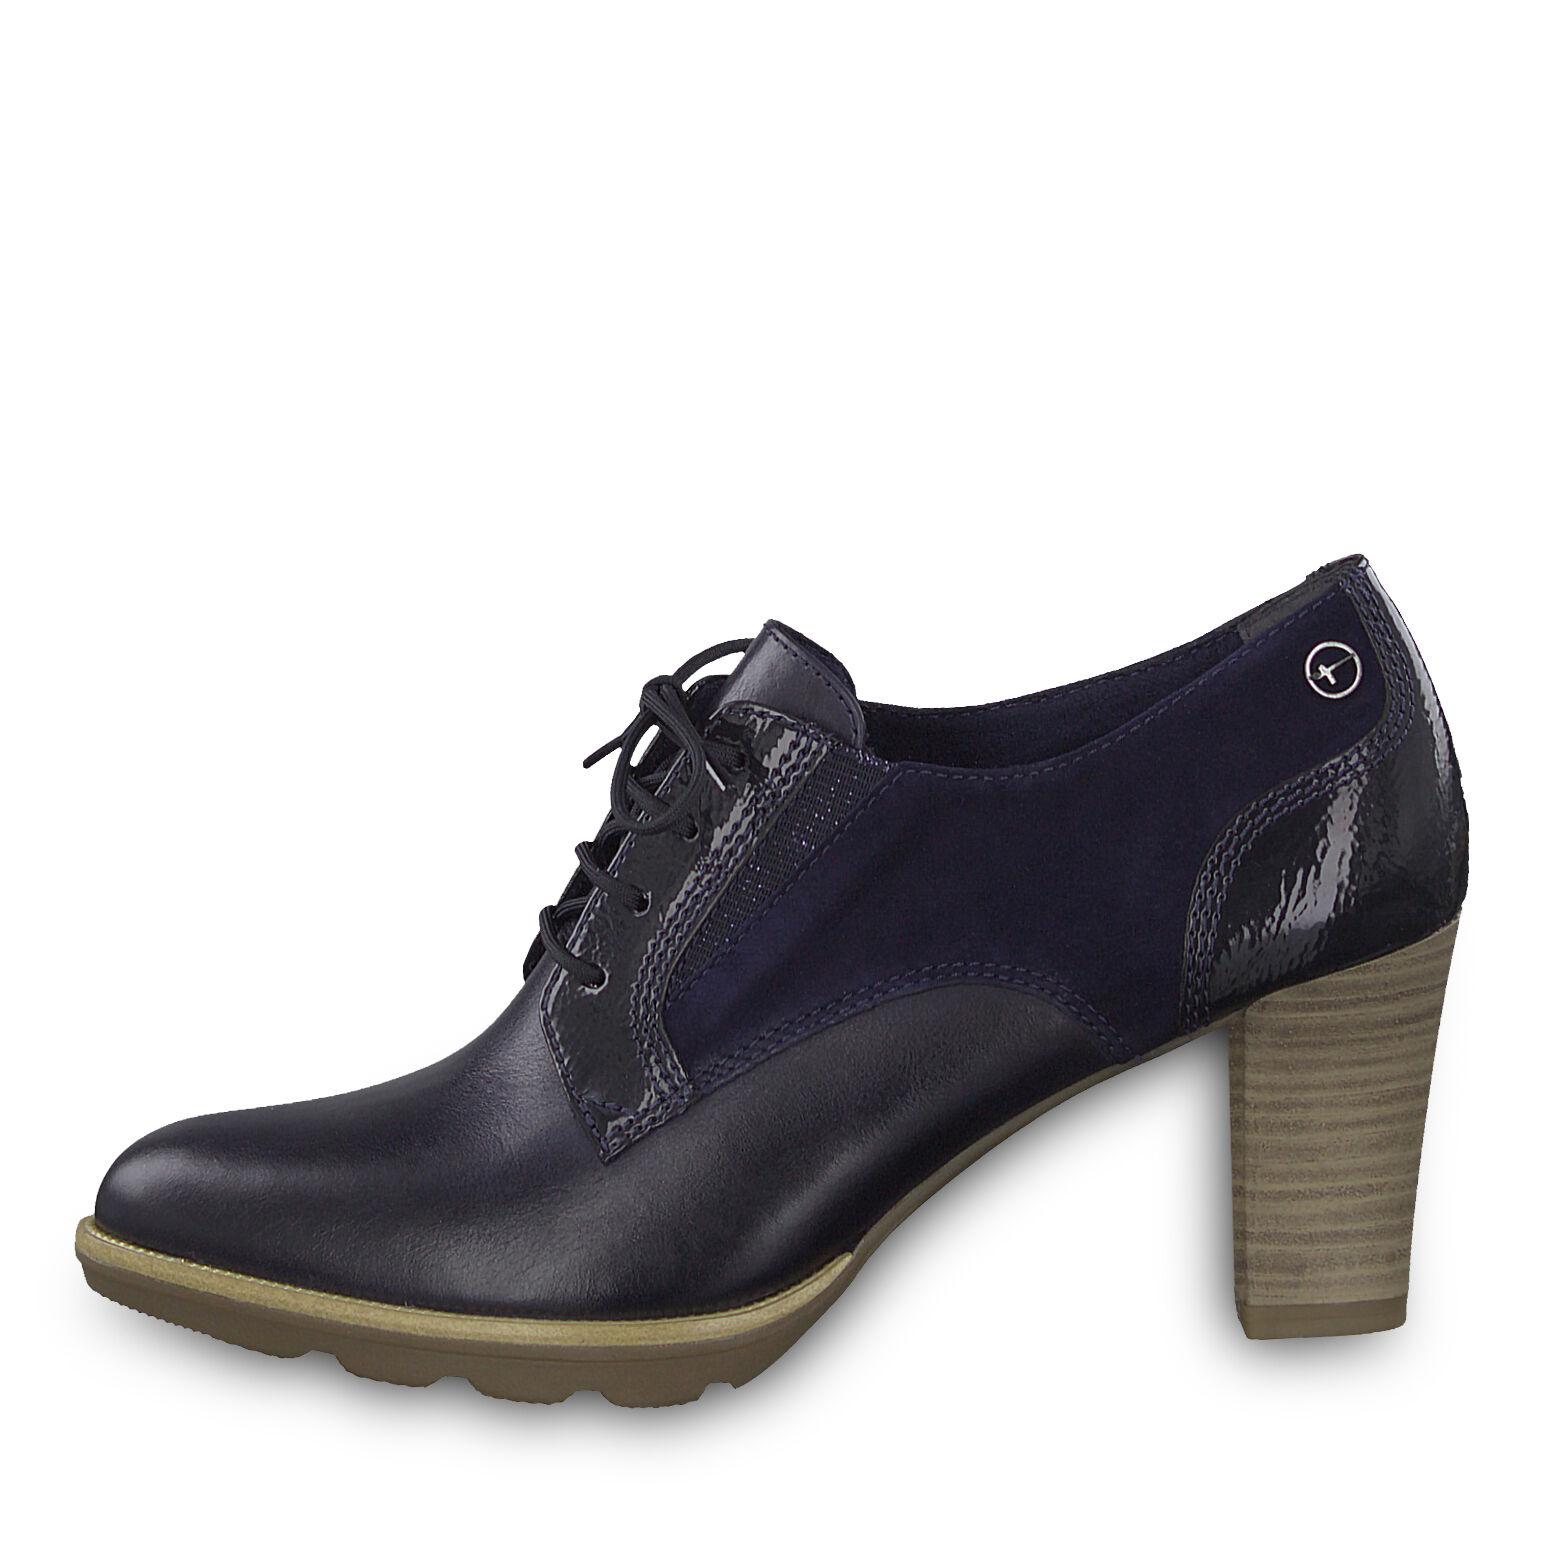 Chaussures Tamaris À À Tamaris Chaussures Lacets Femmes Chaussures Femmes Lacets 6ndxEwxPBq